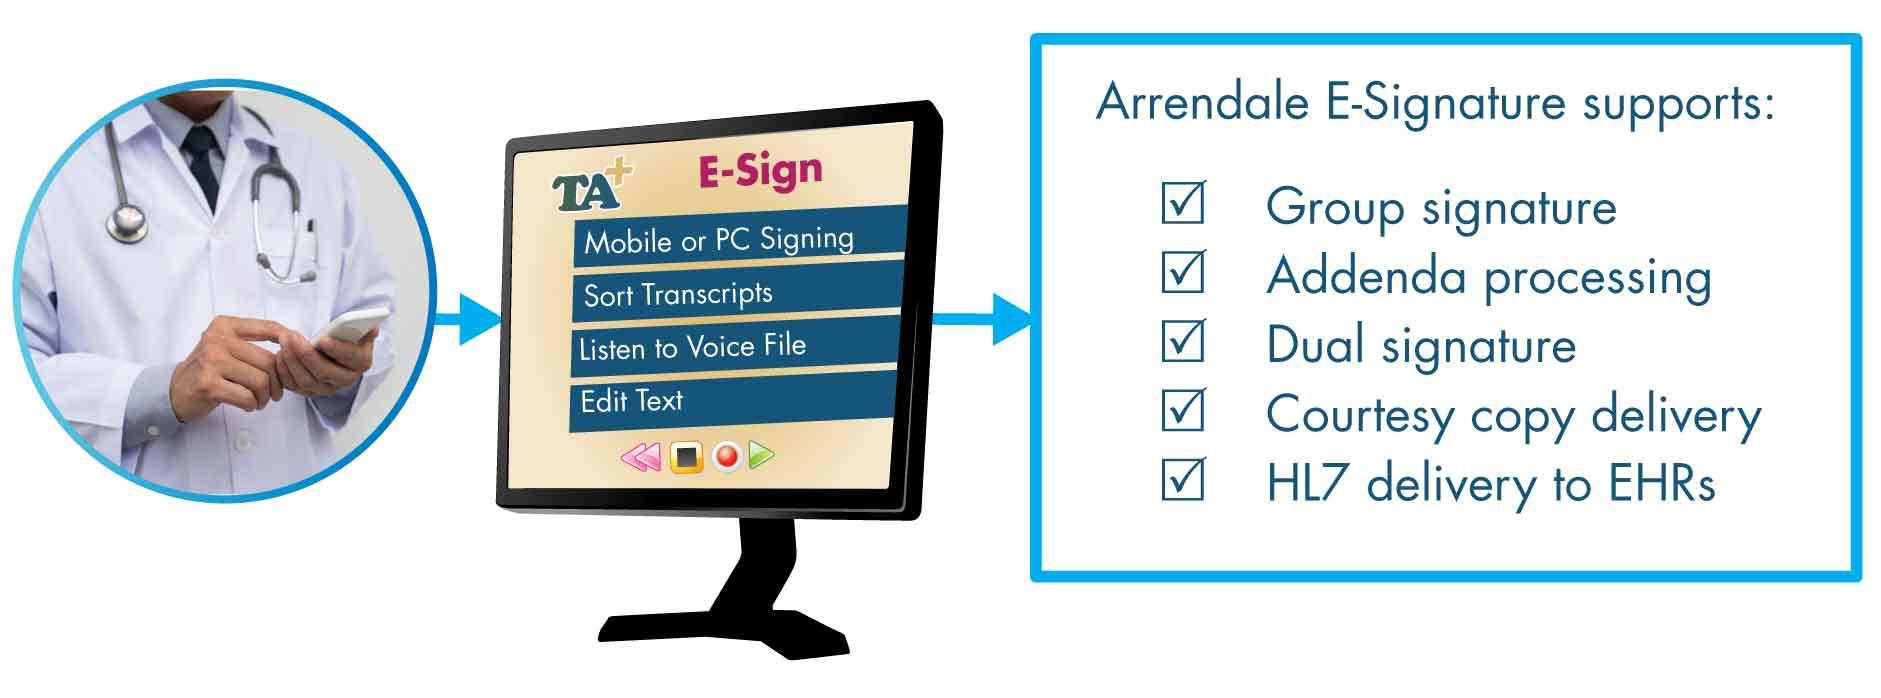 Arrendale E-Signature supports